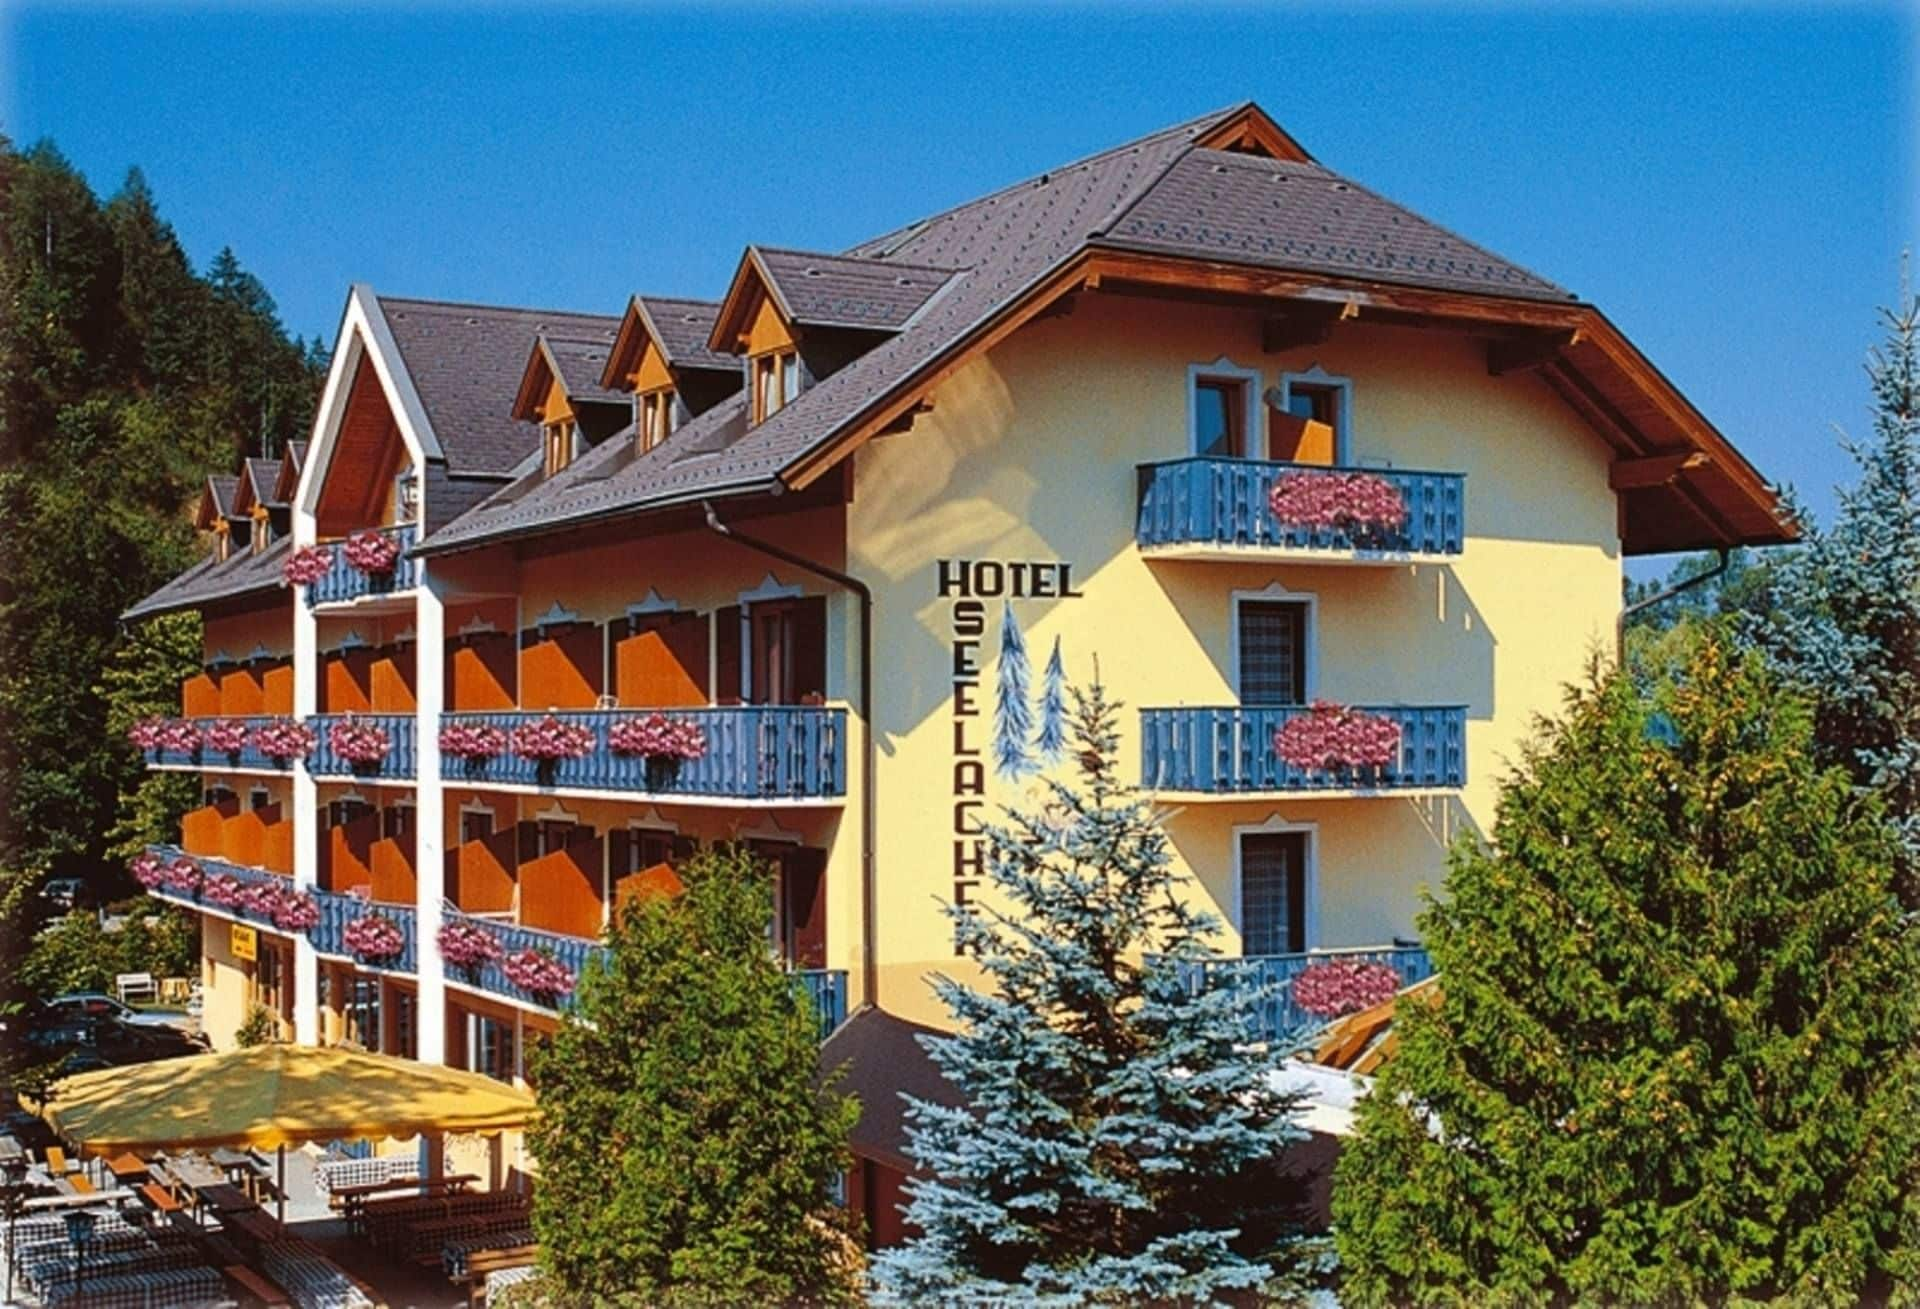 Hotel Seelacherhof, Völkermarkt